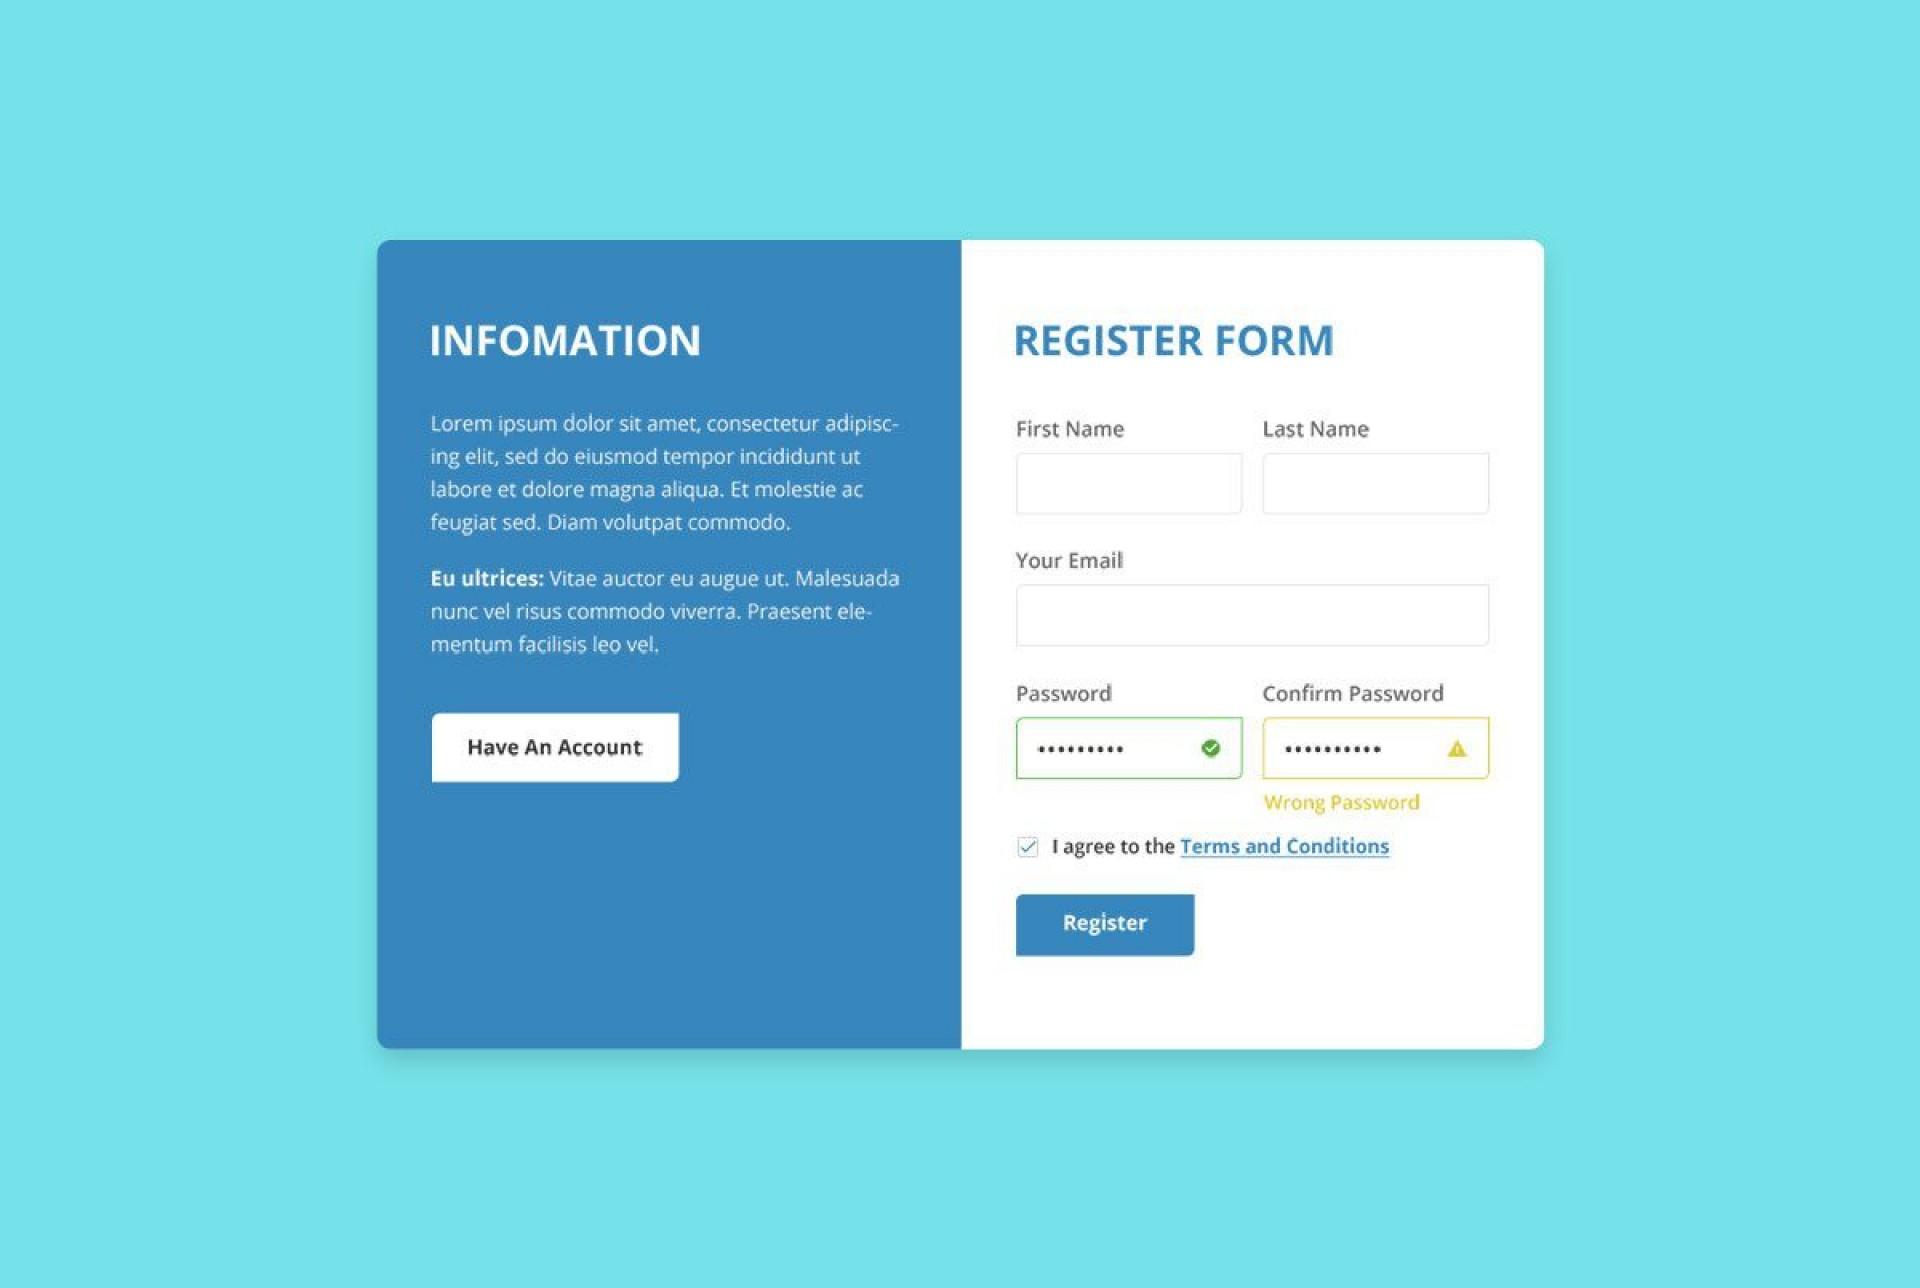 003 Breathtaking Free Html Form Template High Def  Templates Survey Application Download Registration1920